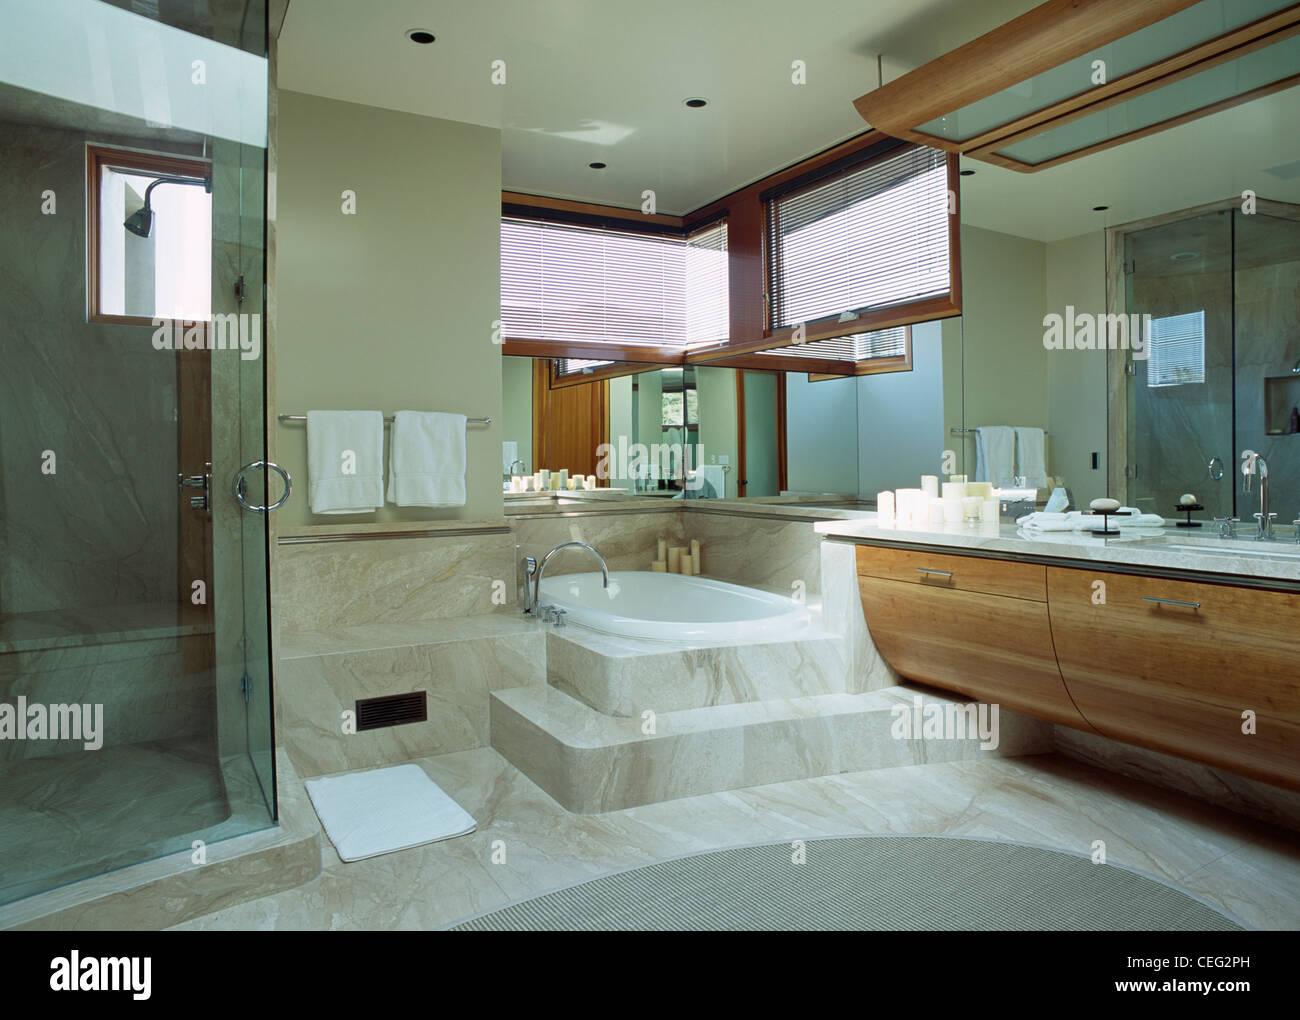 Vasca Da Bagno Con Nicchia : Vasca con vetro doccia